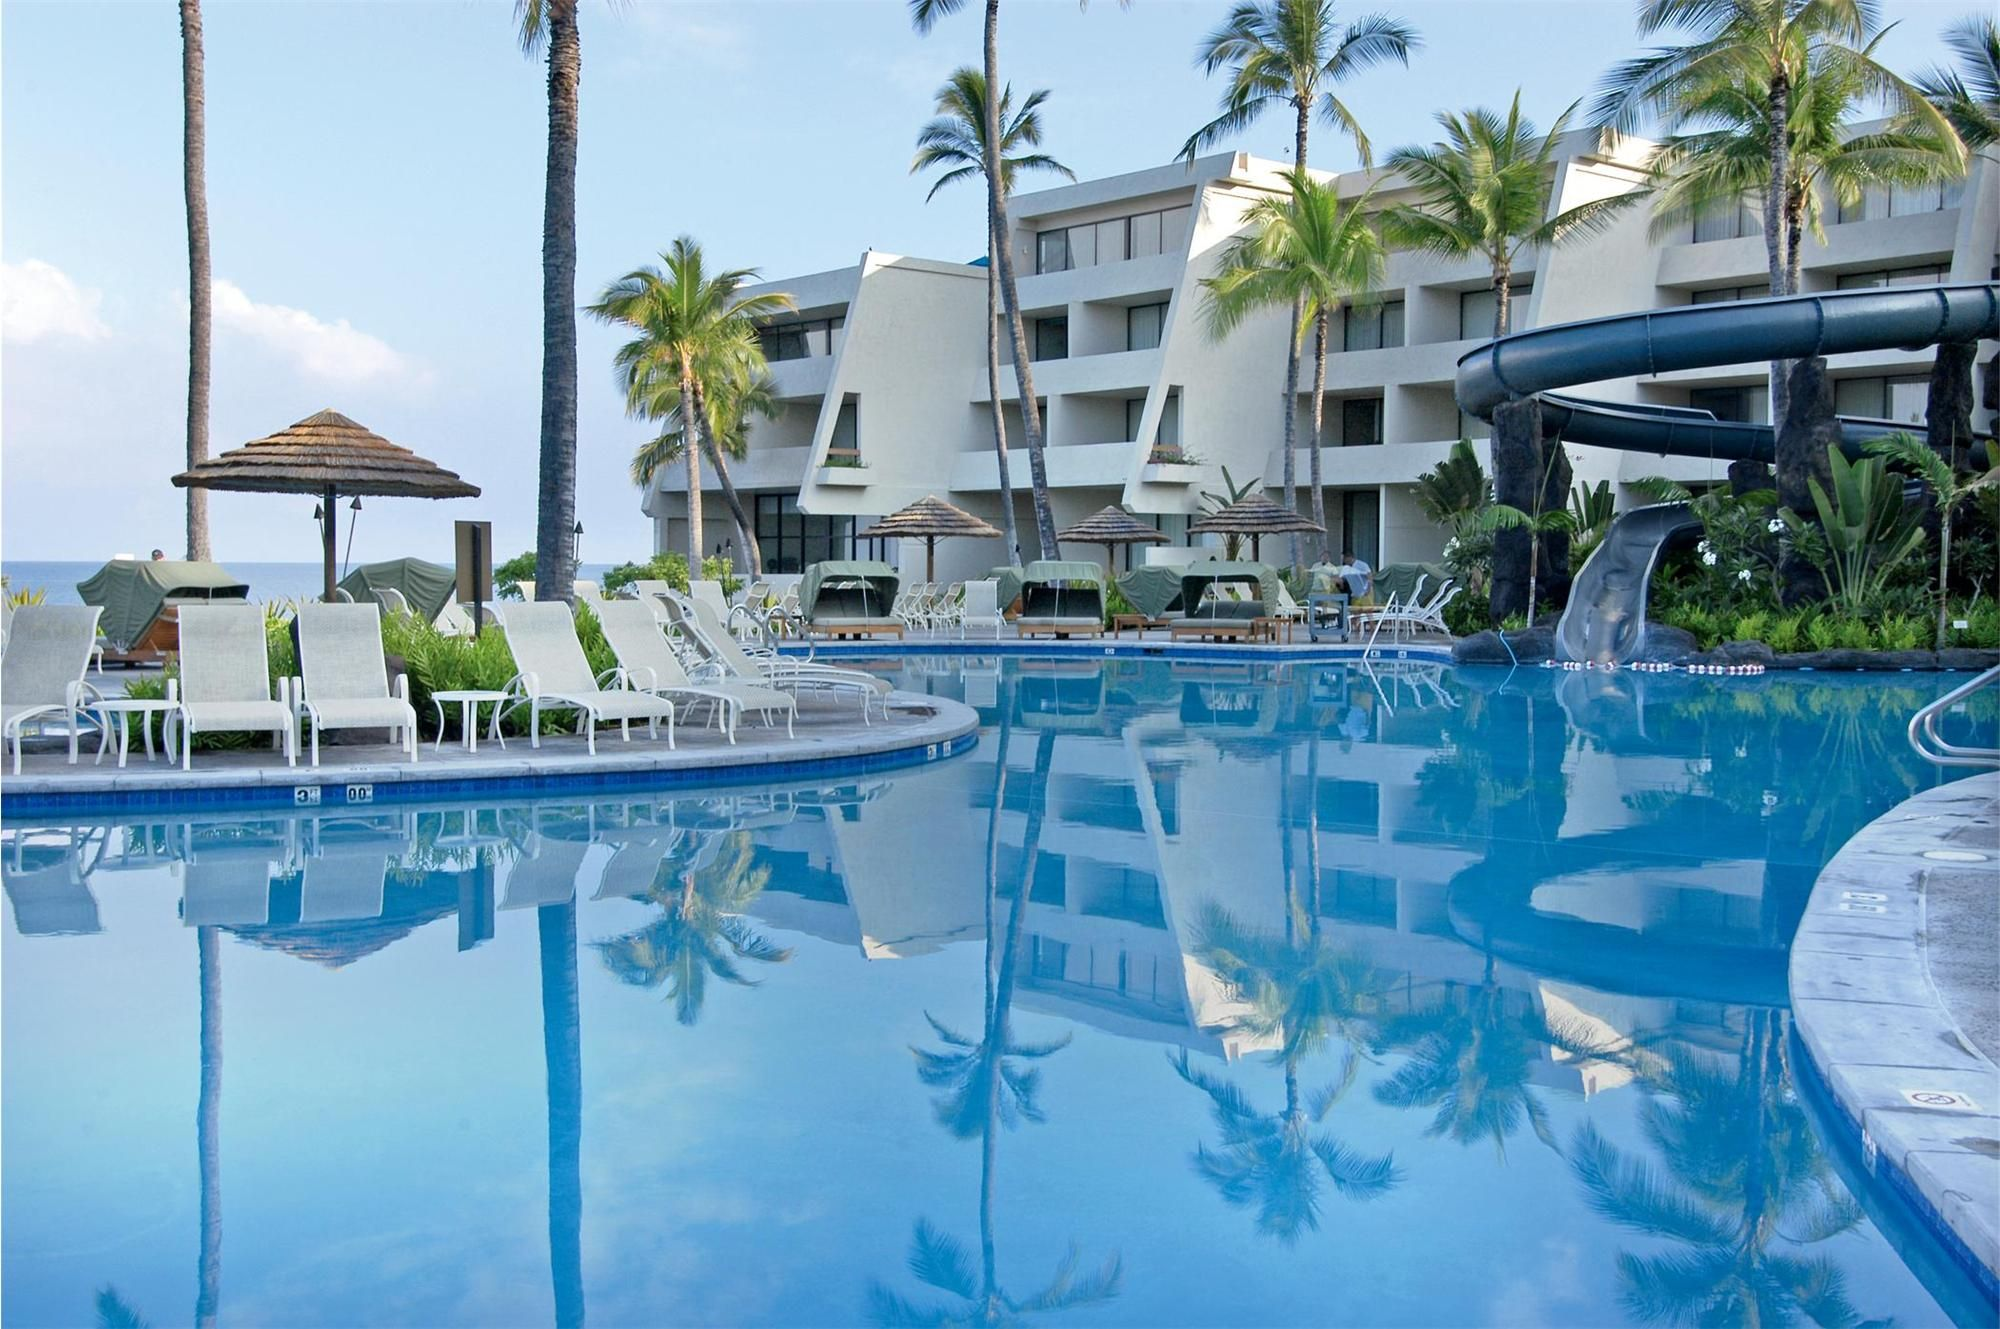 Sheraton Kailua Kona Hotels Resort Spa At Keauhou Bay Hotel